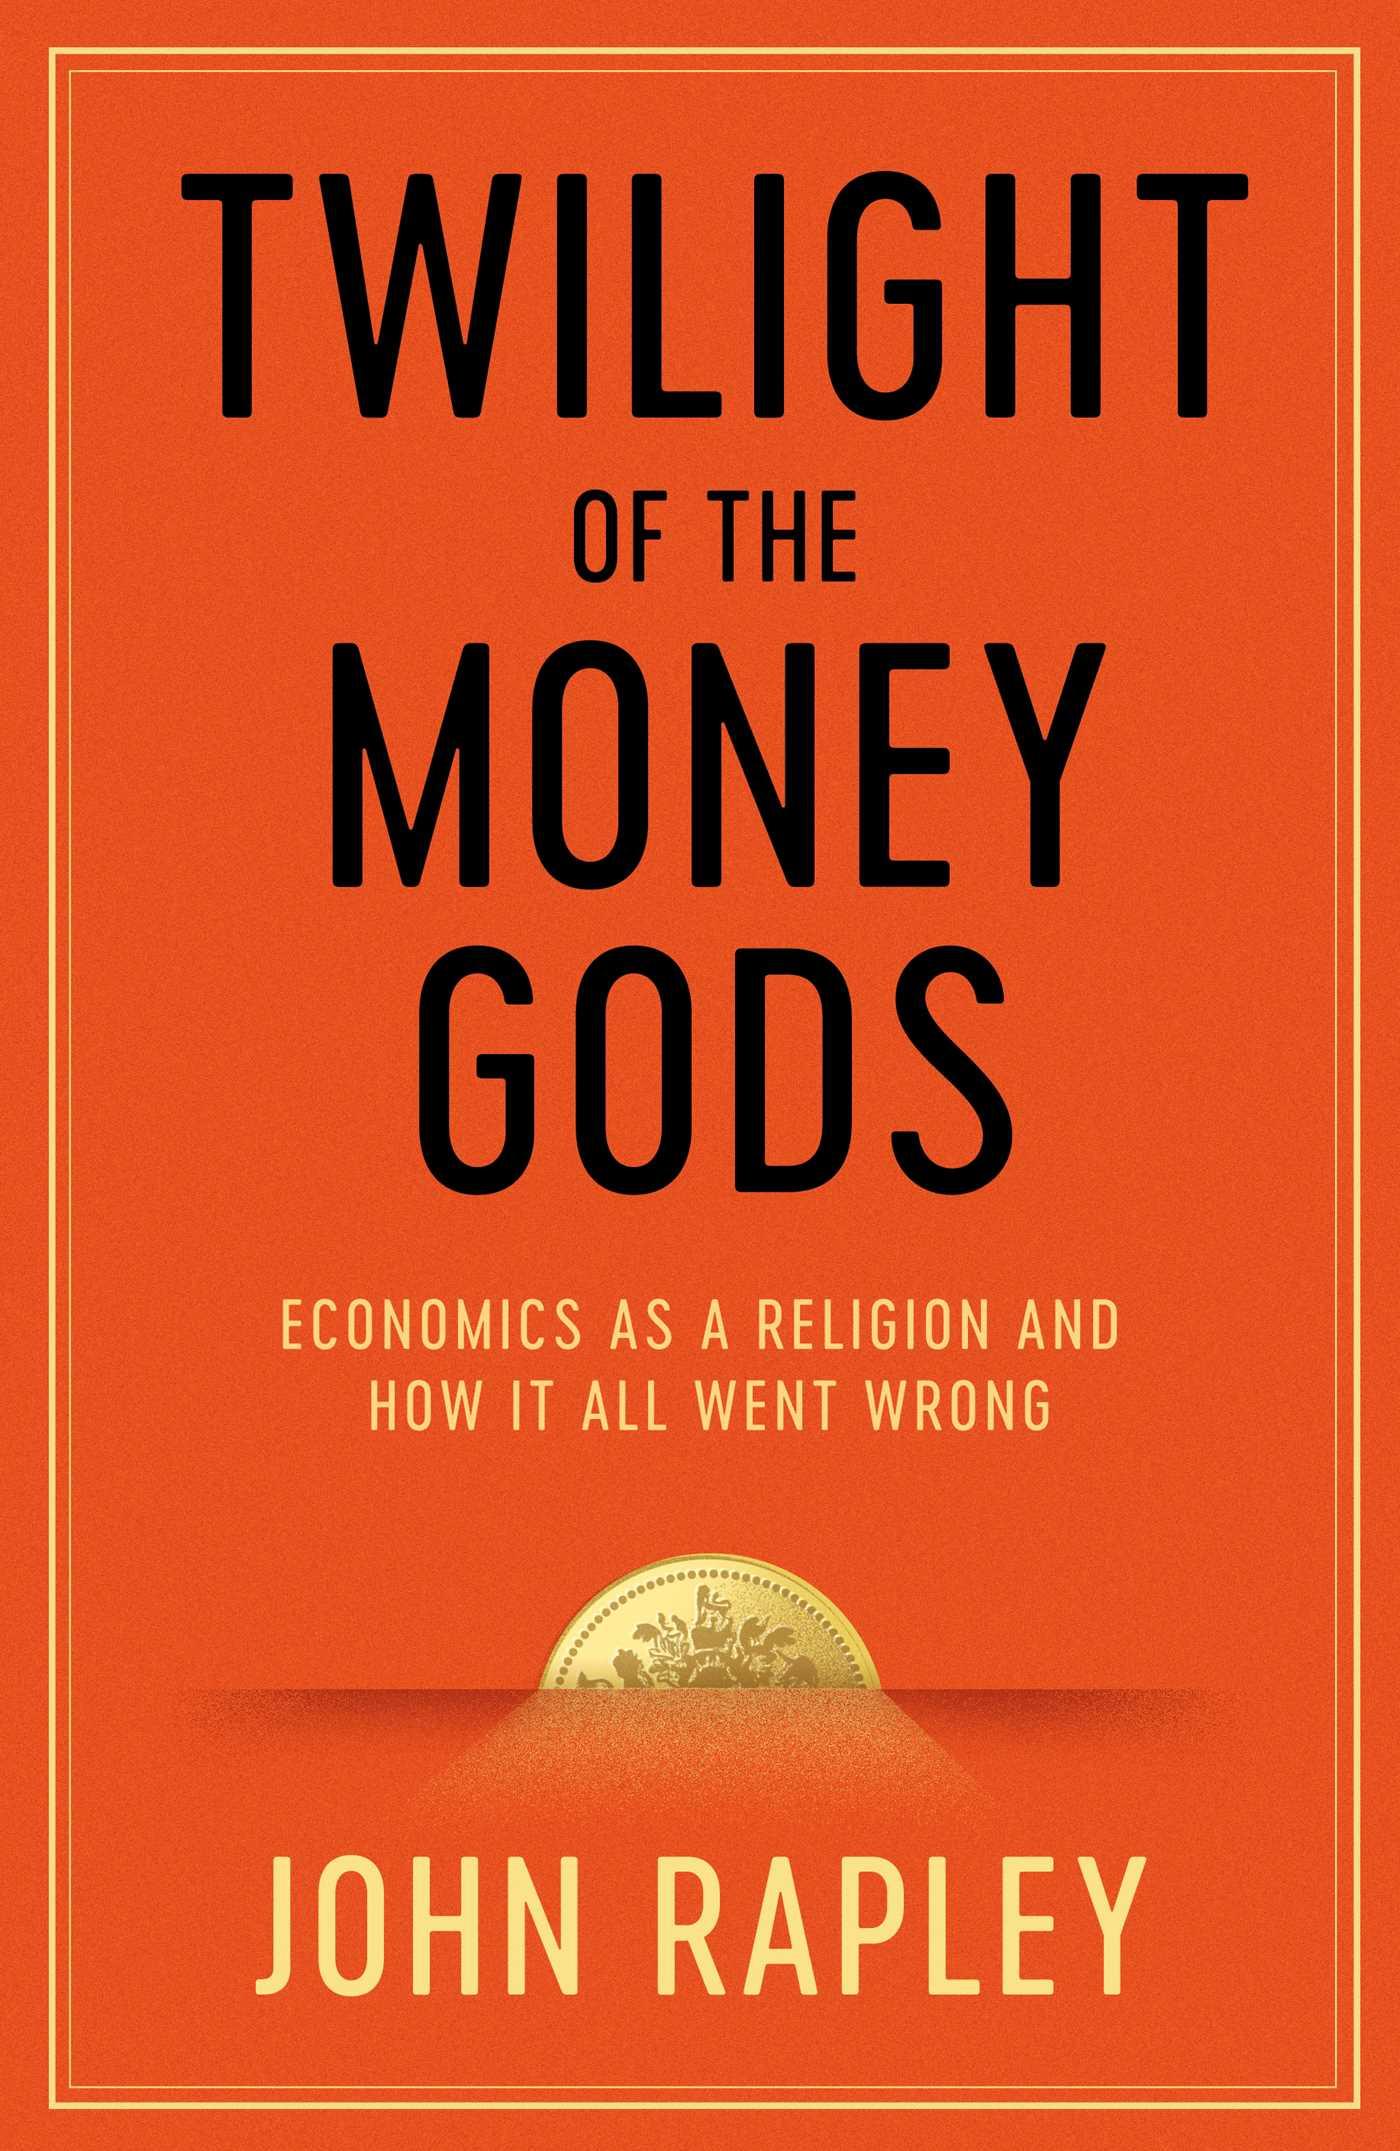 Twilight of the money gods 9781471152771 hr